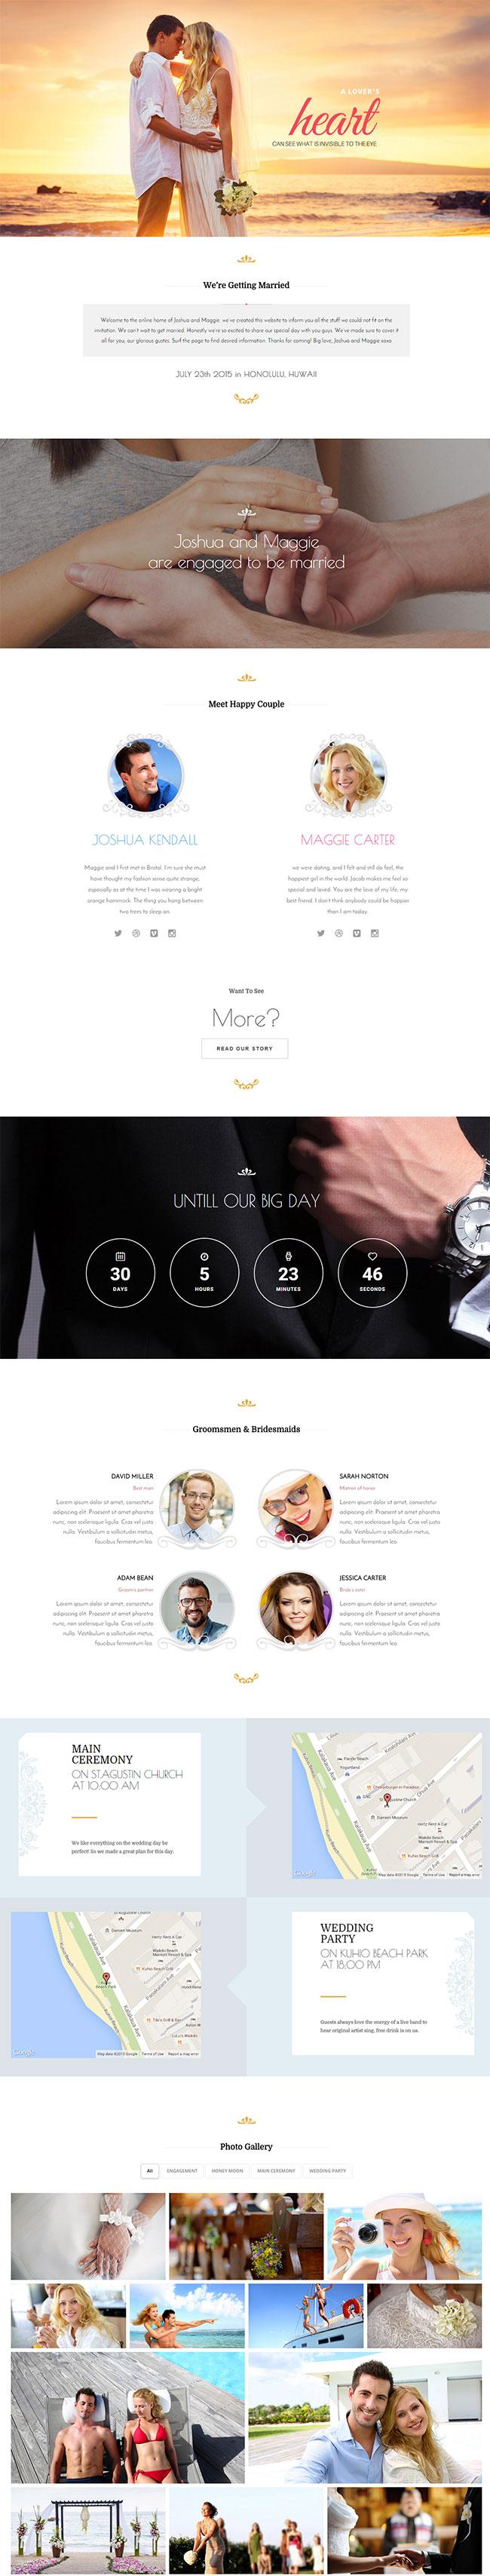 Wedding-Suite-WordPress-Wedding-Theme